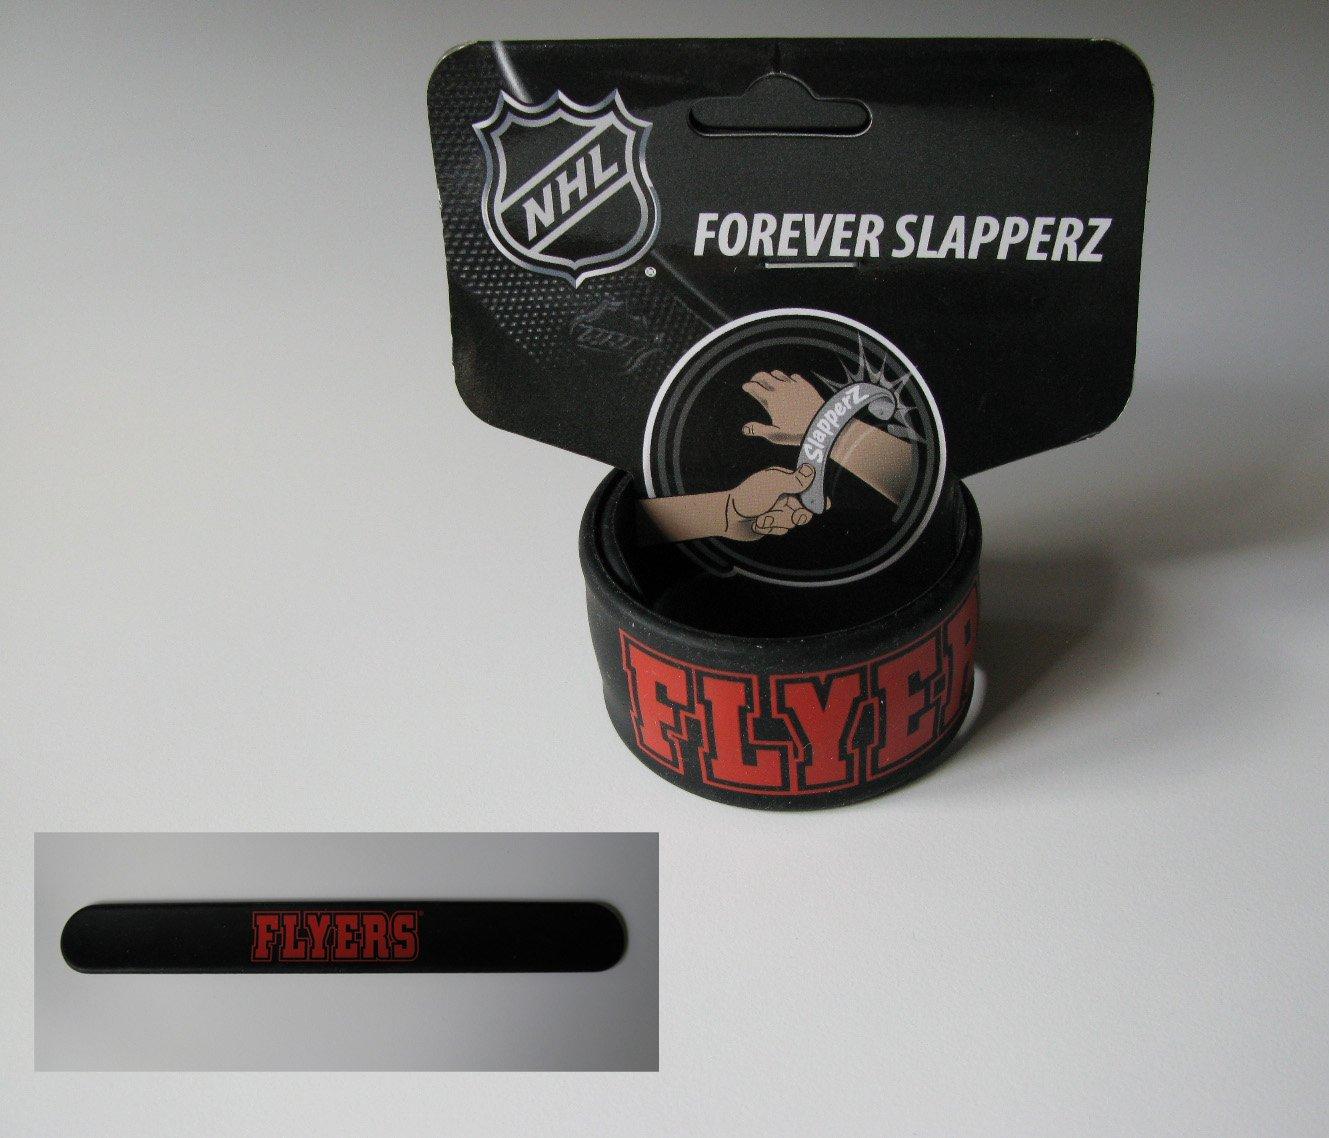 Philadelphia Flyers Rubber Puck Slapperz Band Bracelet